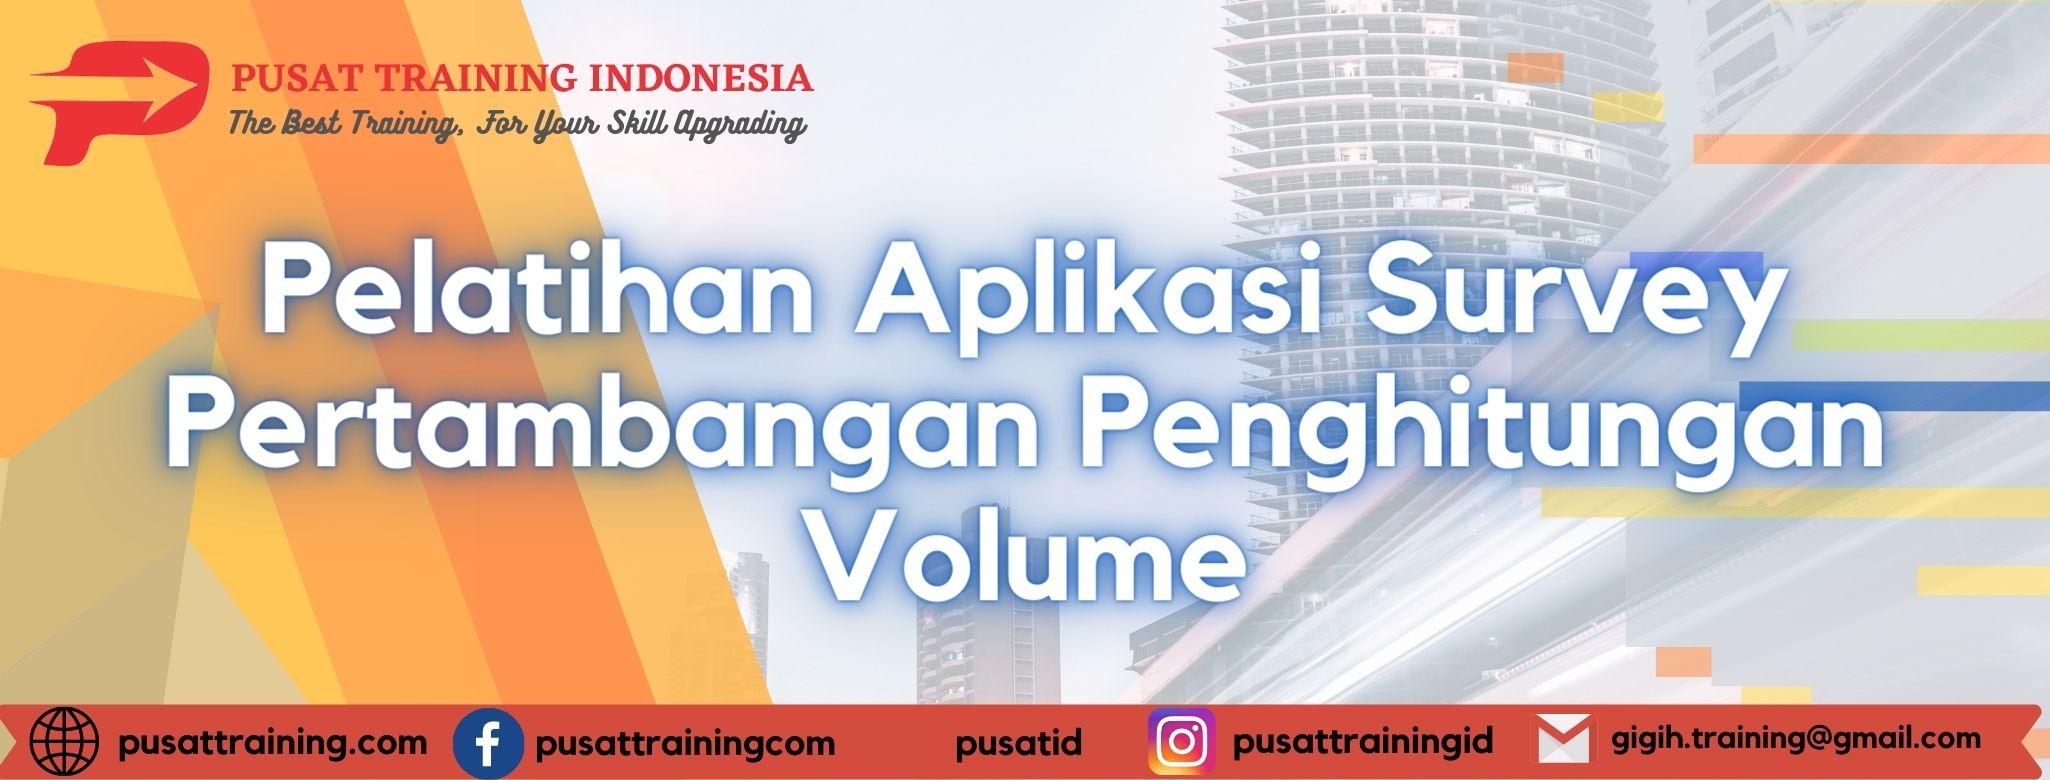 Pelatihan-Aplikasi-Survey-Pertambangan-Penghitungan-Volume